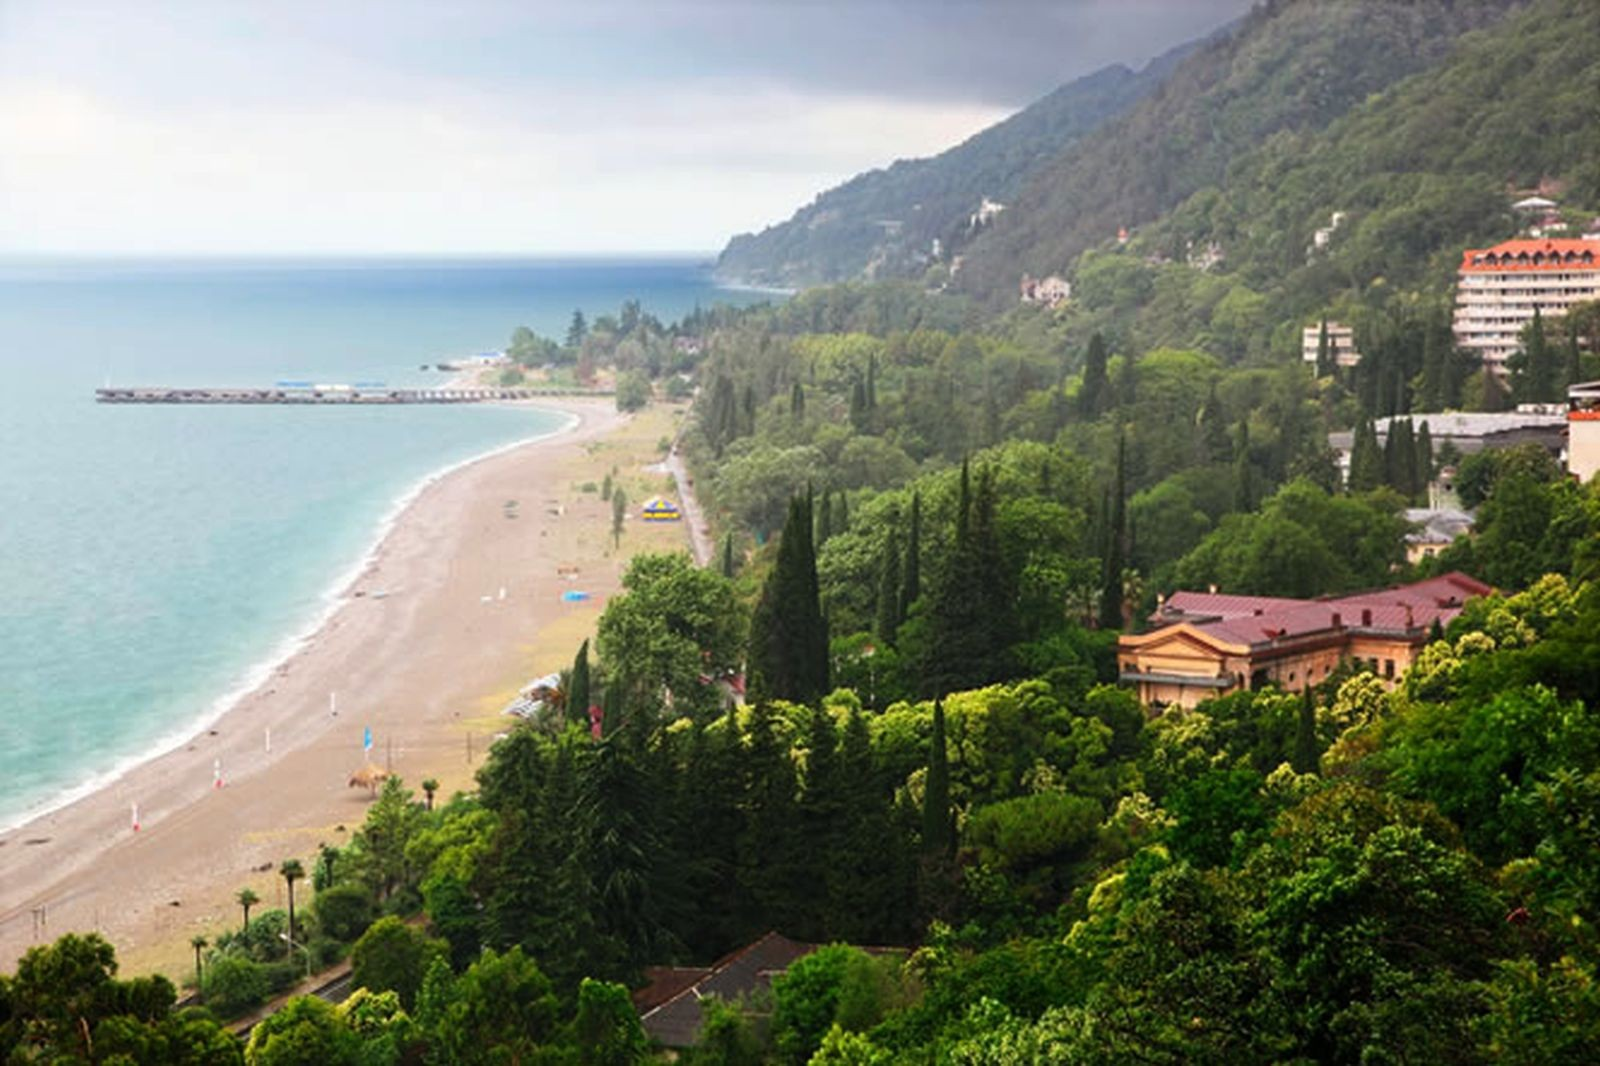 Тур в Абхазию на 2 дня с настоящим абхазским застольем